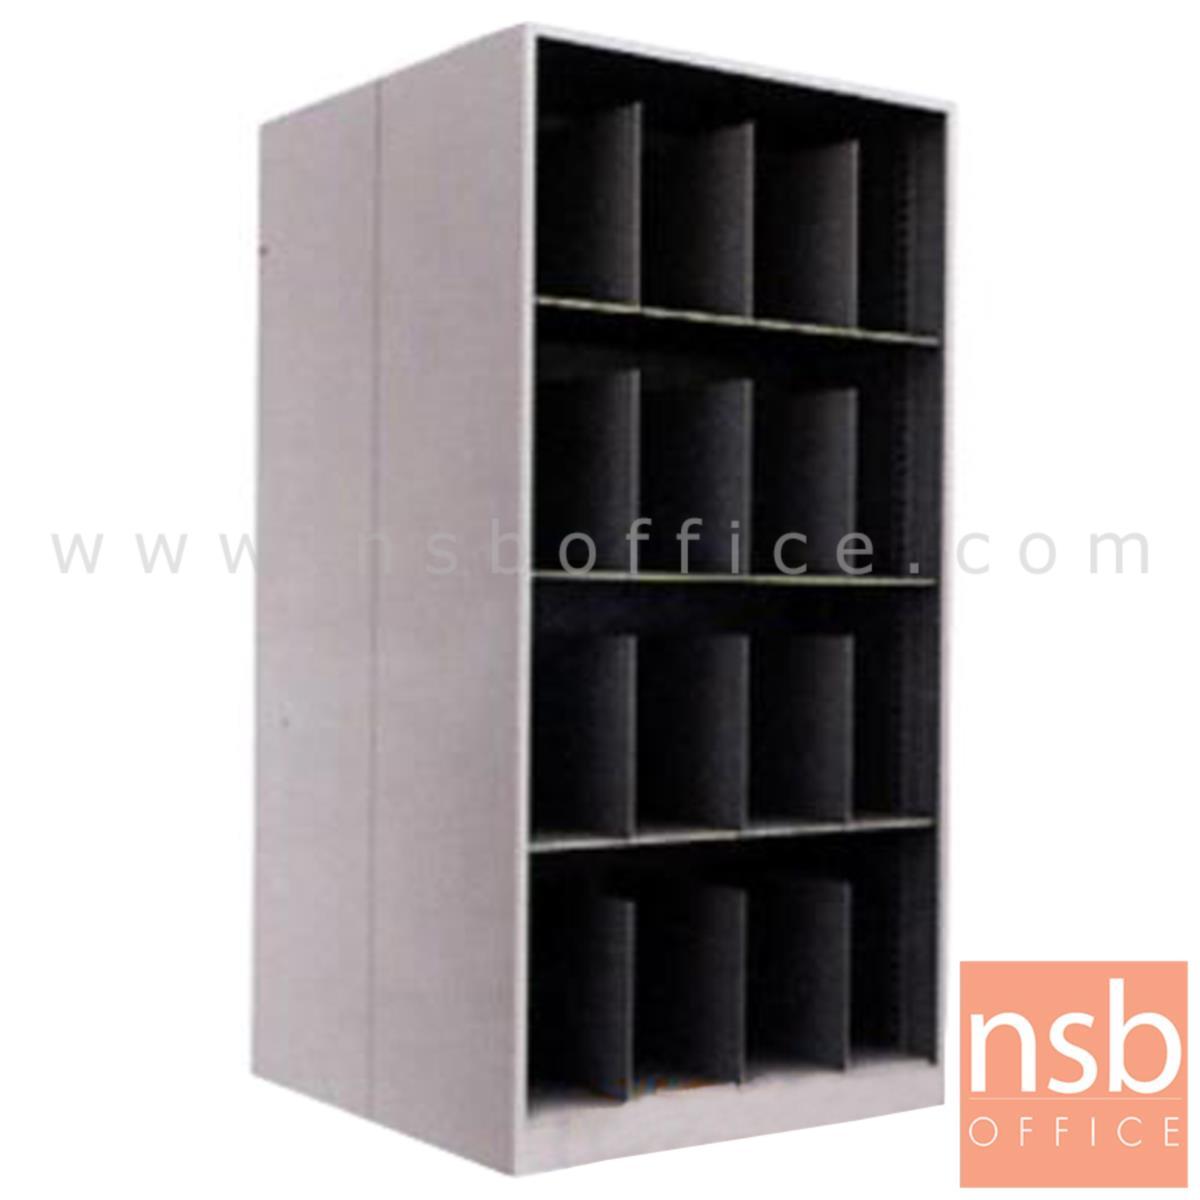 D01A027:ตู้เก็บฟิล์มเอ็กซเรย์ XRV 2 หน้า 4 ชั้น 32 ช่อง  รุ่น Harlow (ฮาโรว) ขนาด 106.6W*213.5H cm.